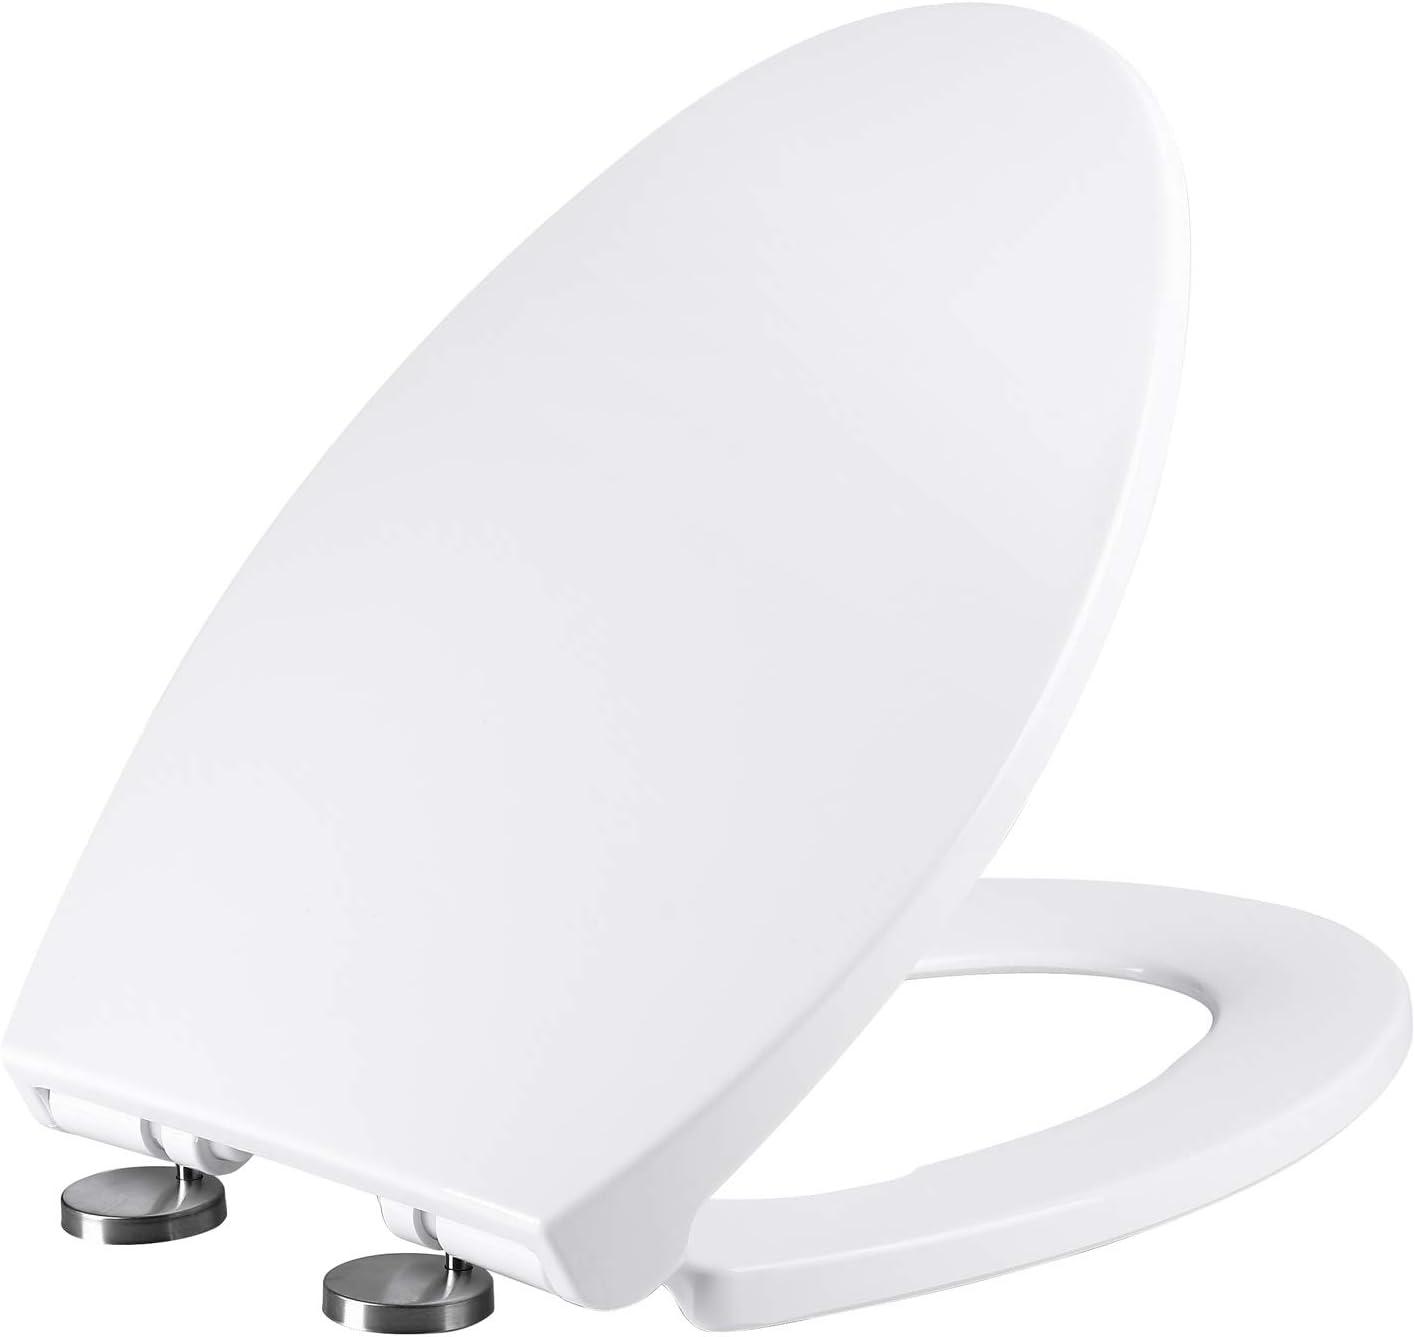 MUYE Elongated Toilet Seat Quiet-Close Never Loosen Quick Release White Toilet Seats Easy Installation No Slamming